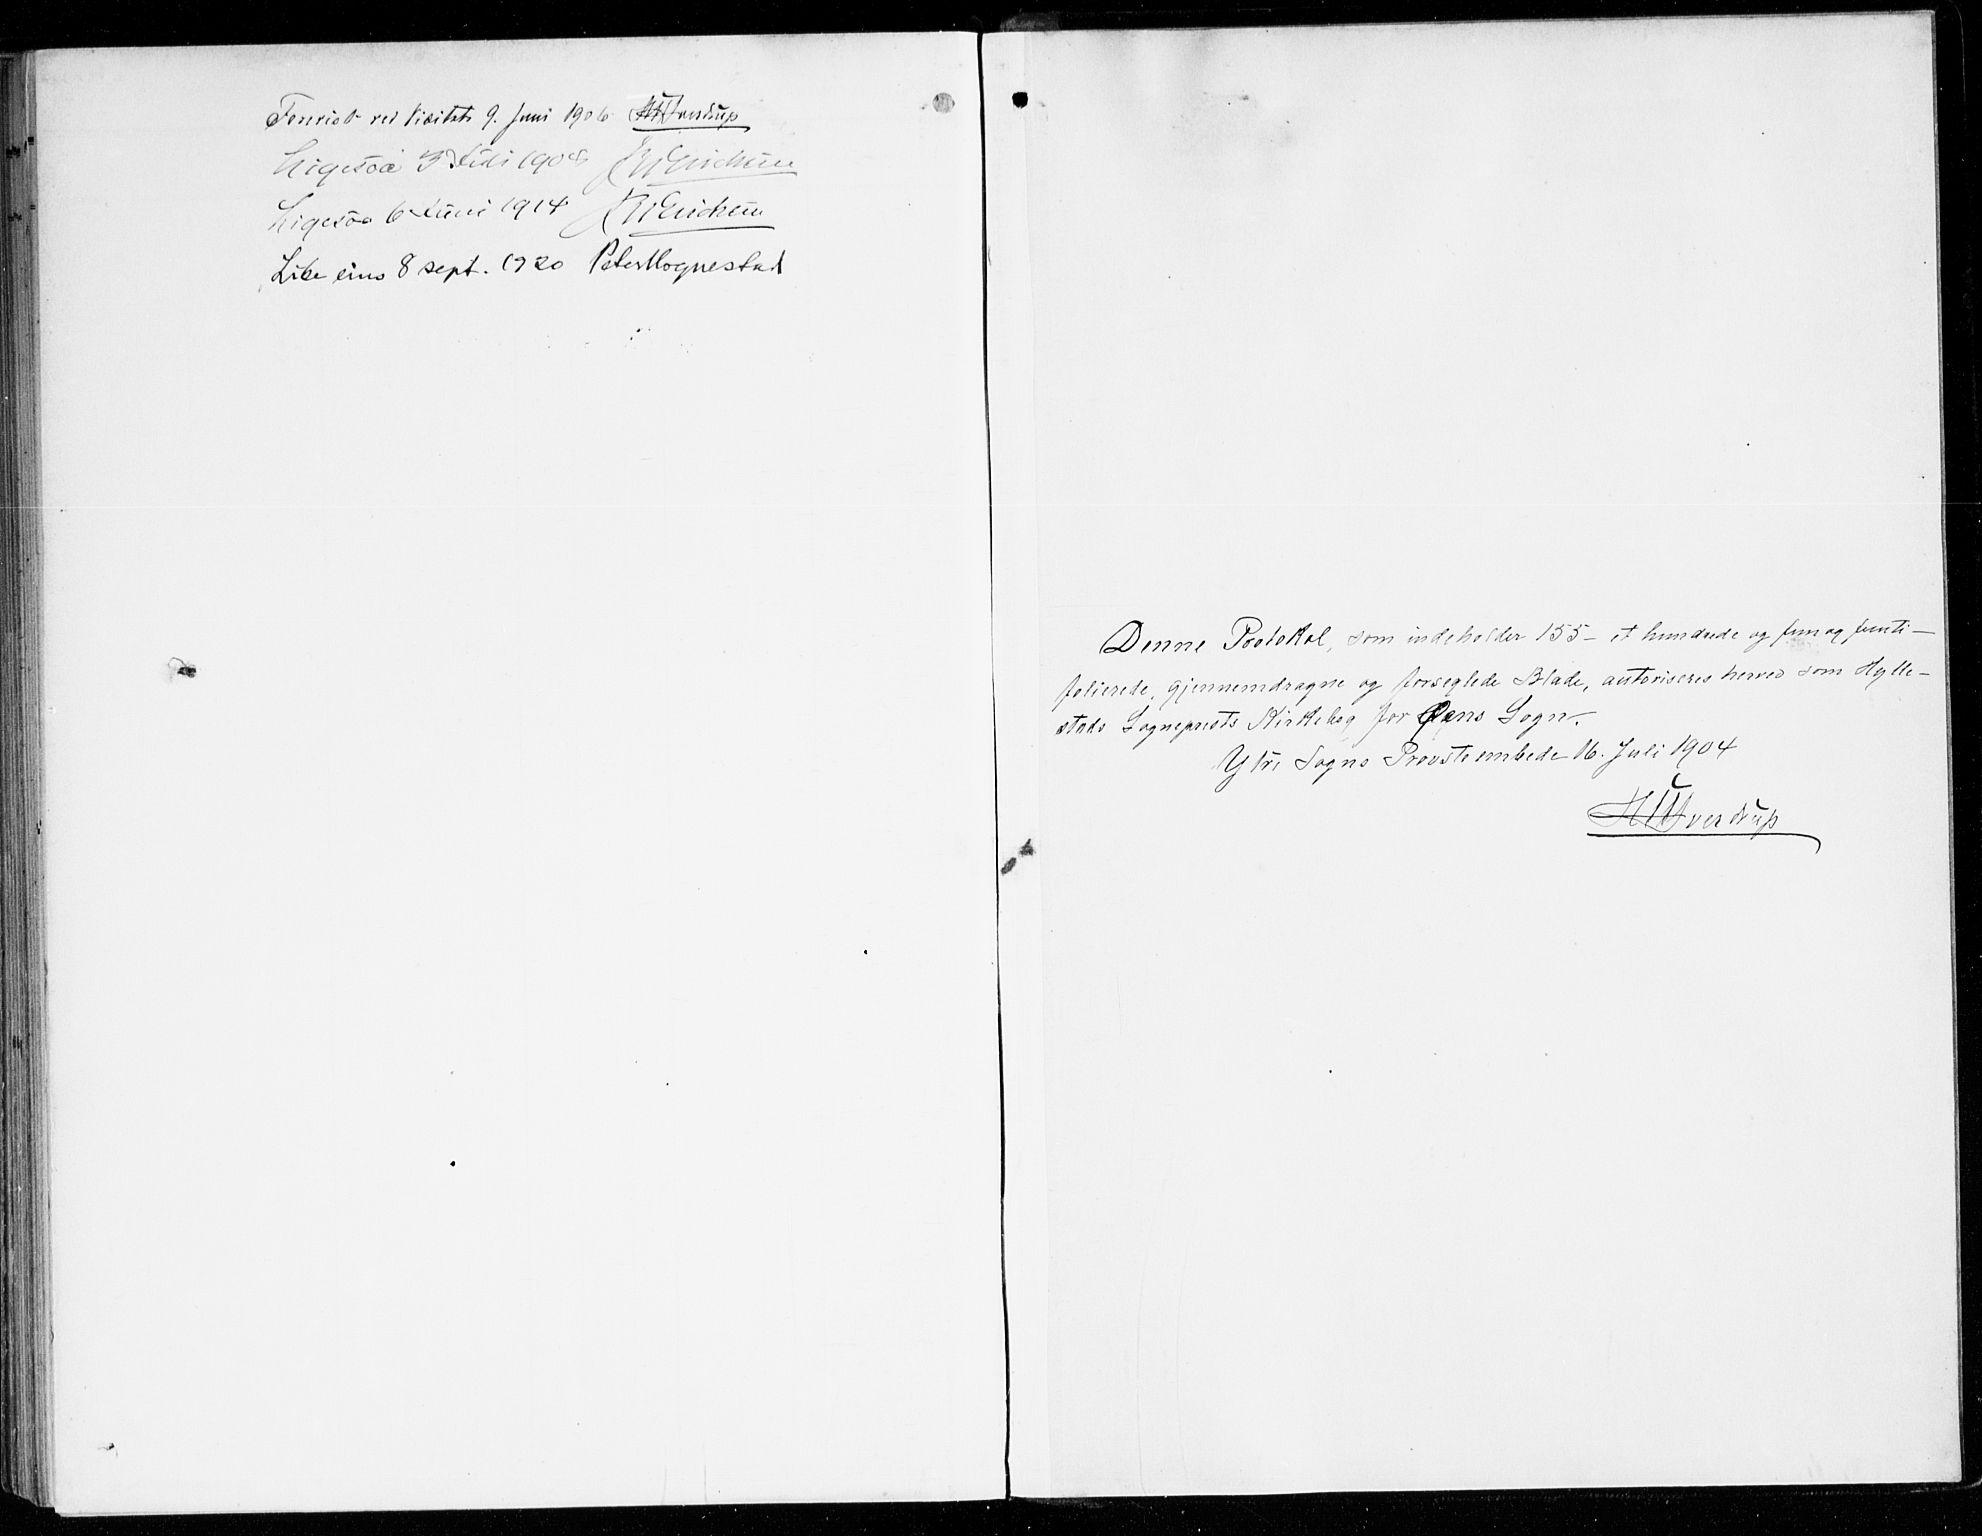 SAB, Hyllestad Sokneprestembete, Ministerialbok nr. D 2, 1905-1919